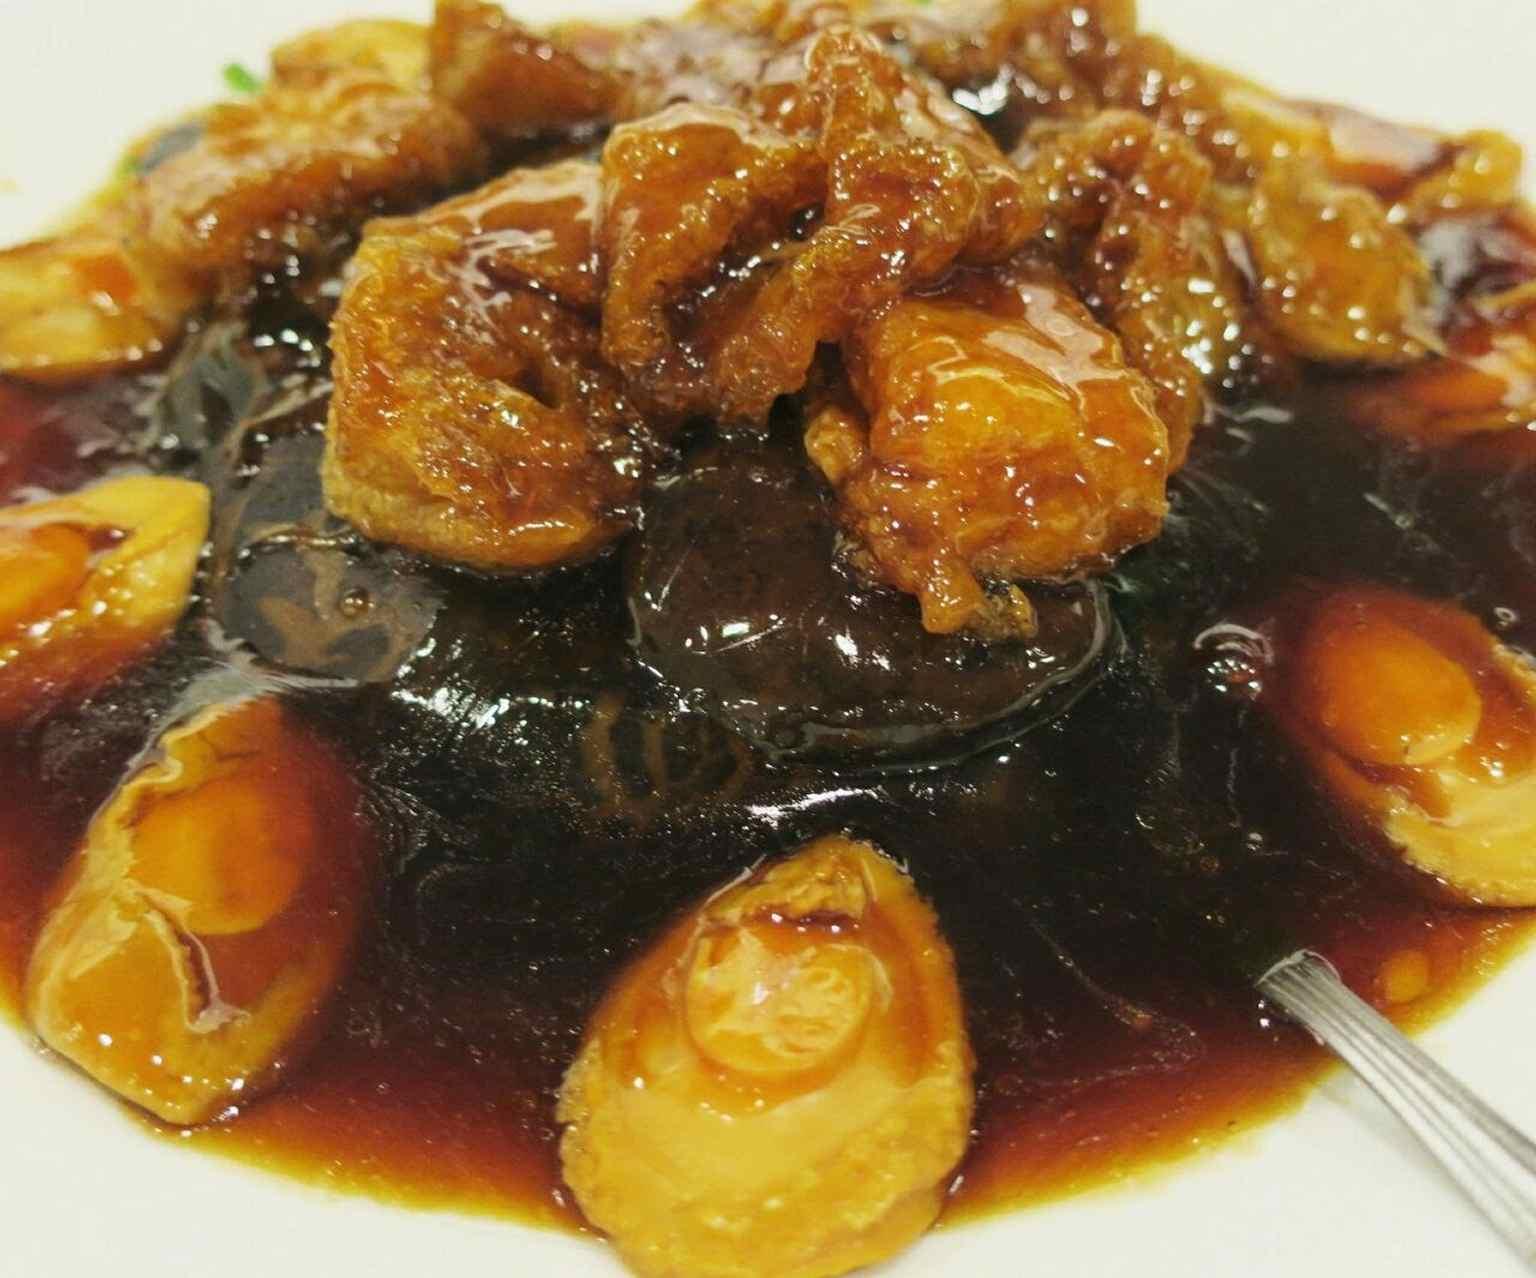 Braised Abalone, Mushrooms and Fish Maw